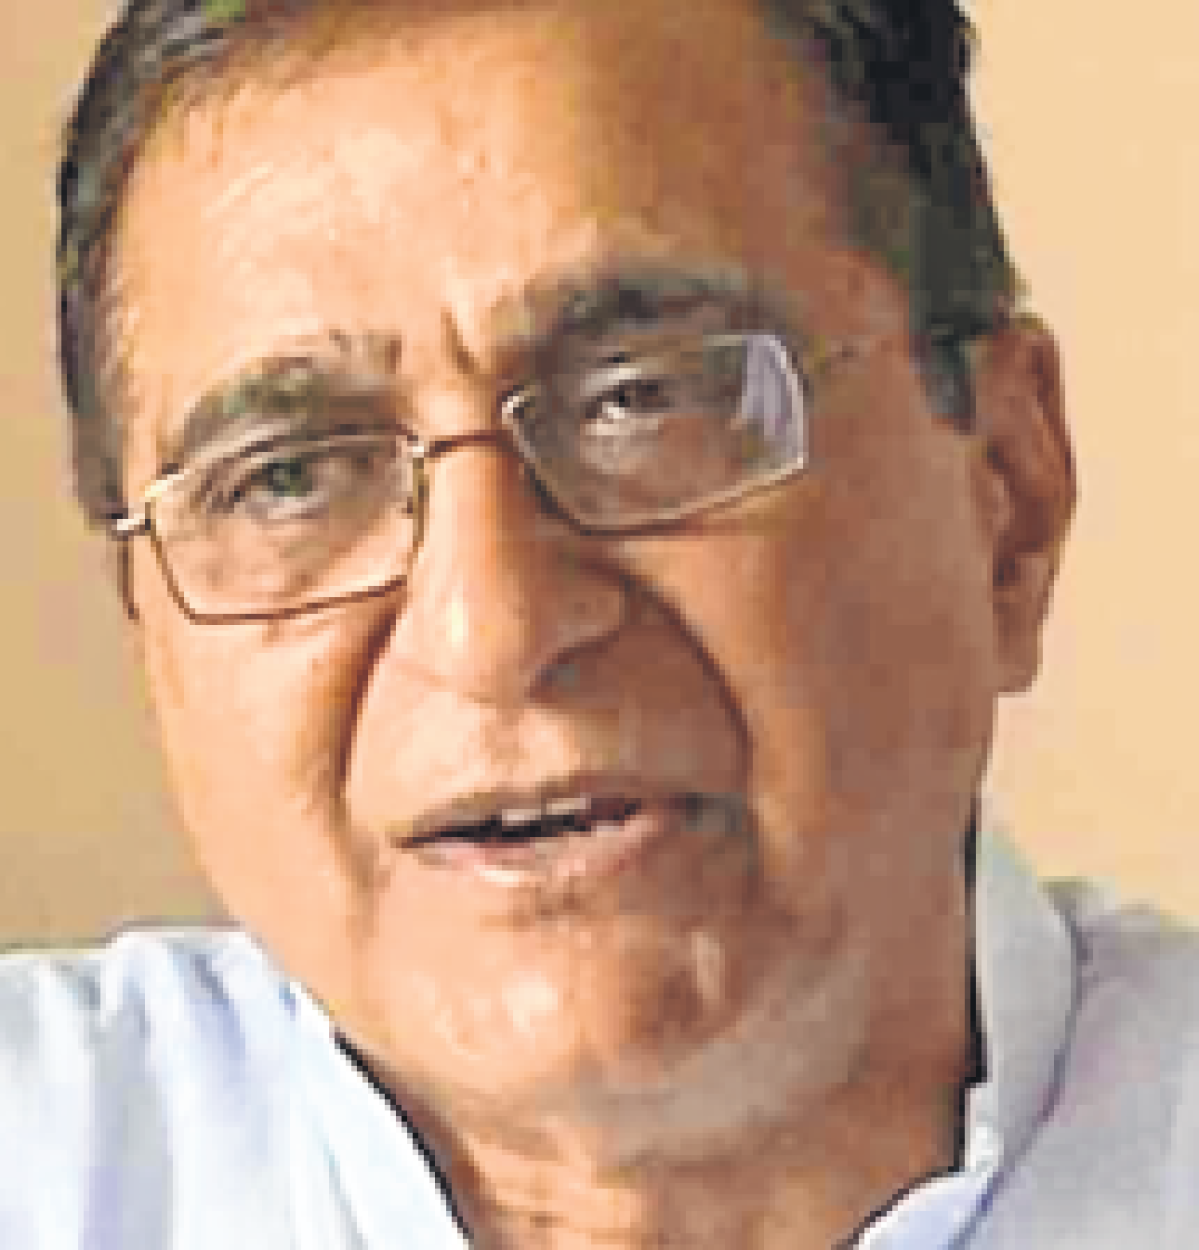 Bhopal: Short of candidates, Congress eyes ex-MLAs